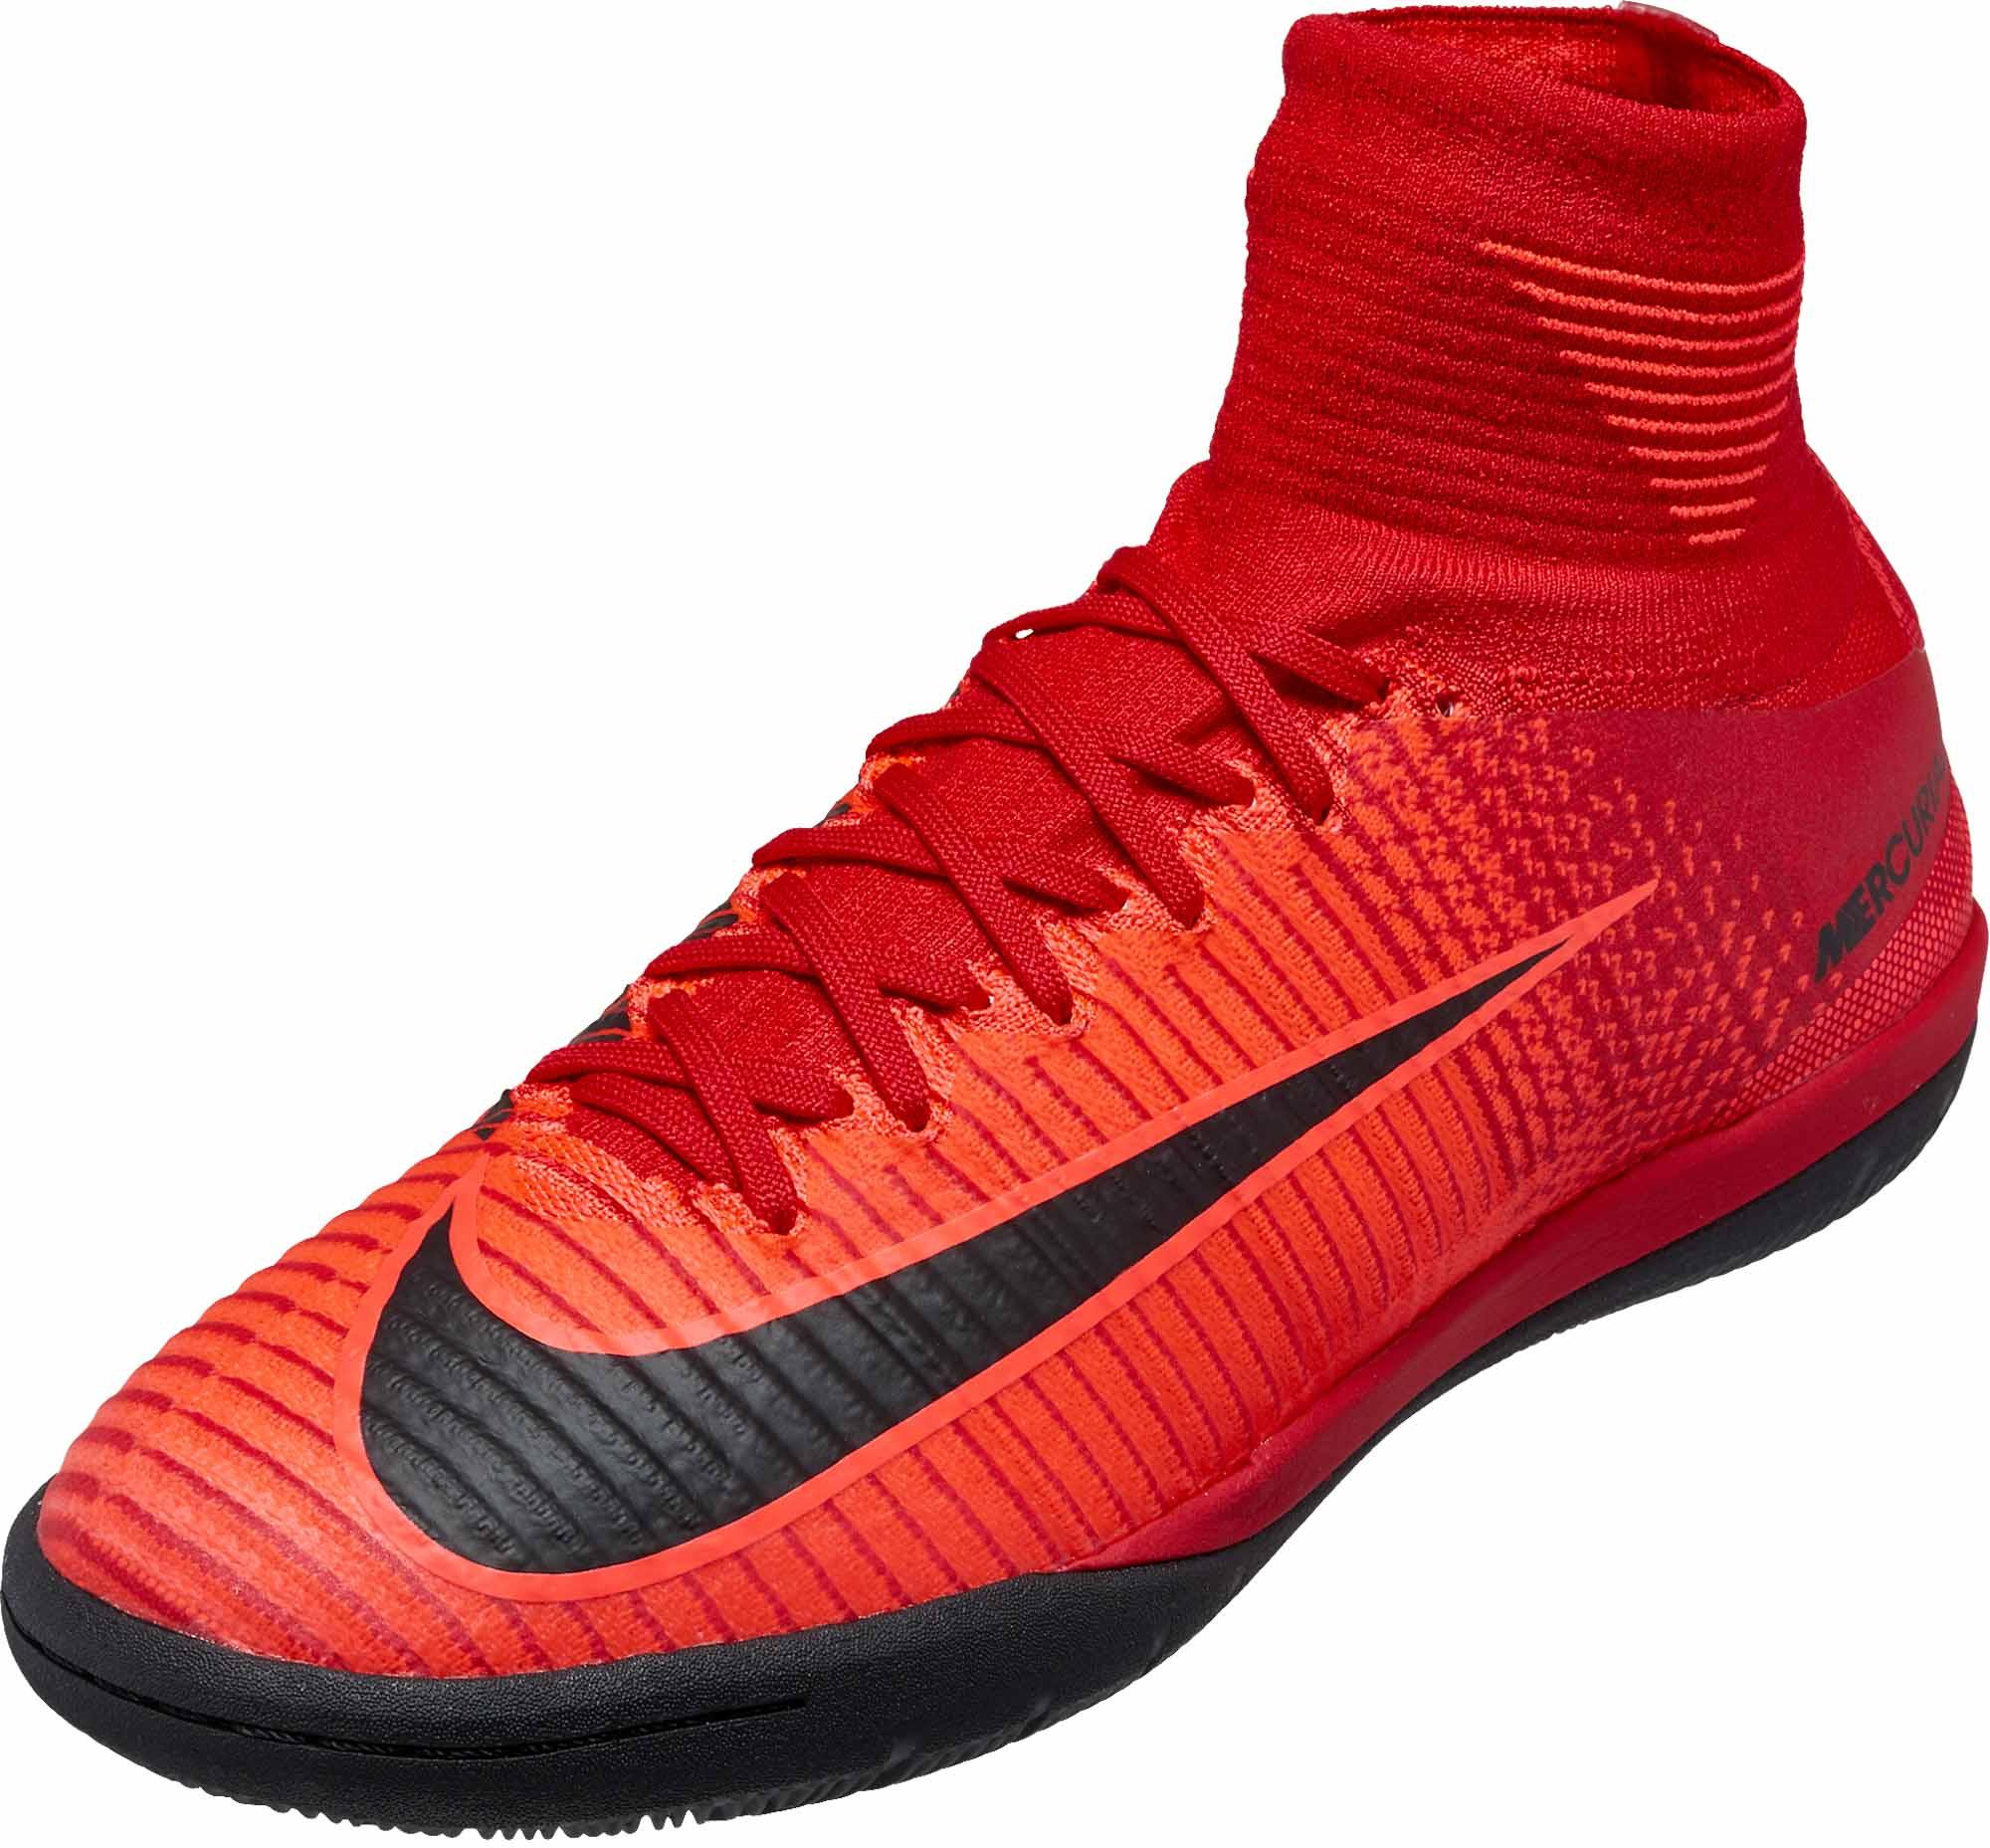 huge selection of 69c8b 63c4d Nike MercurialX Proximo II IC – University Red Black